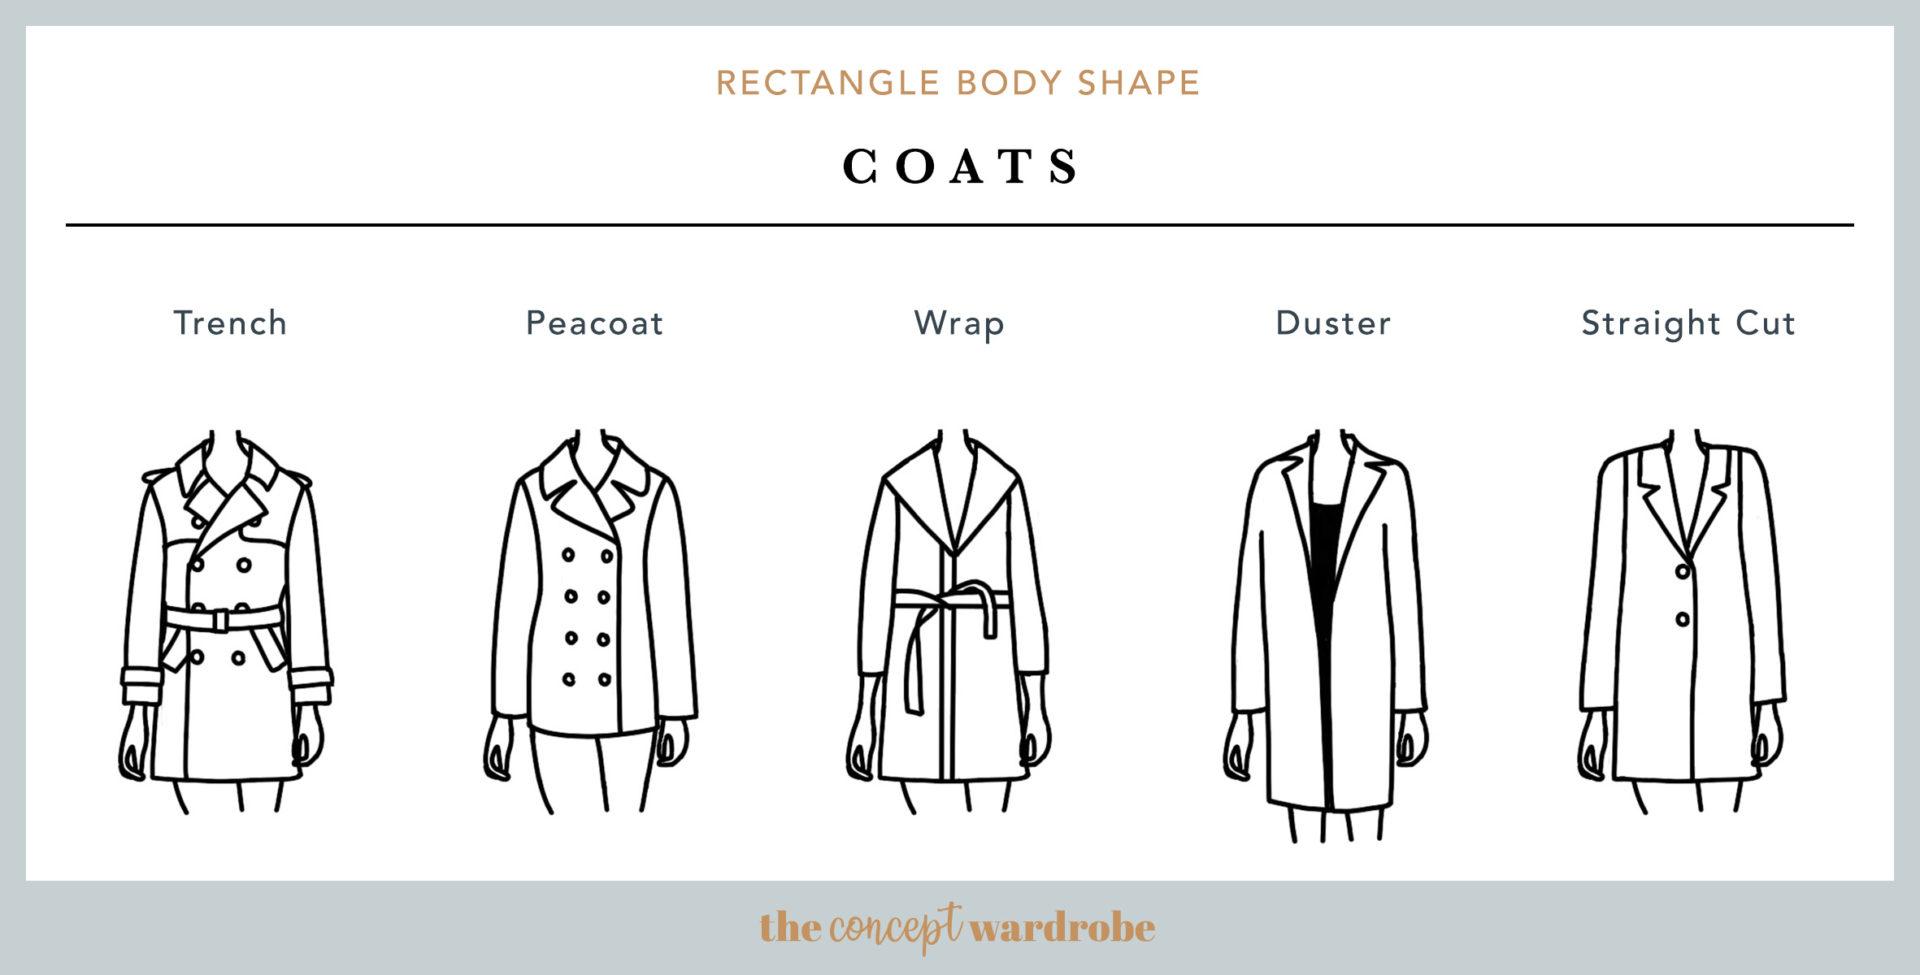 Rectangle Body Shape Coats - the concept wardrobe